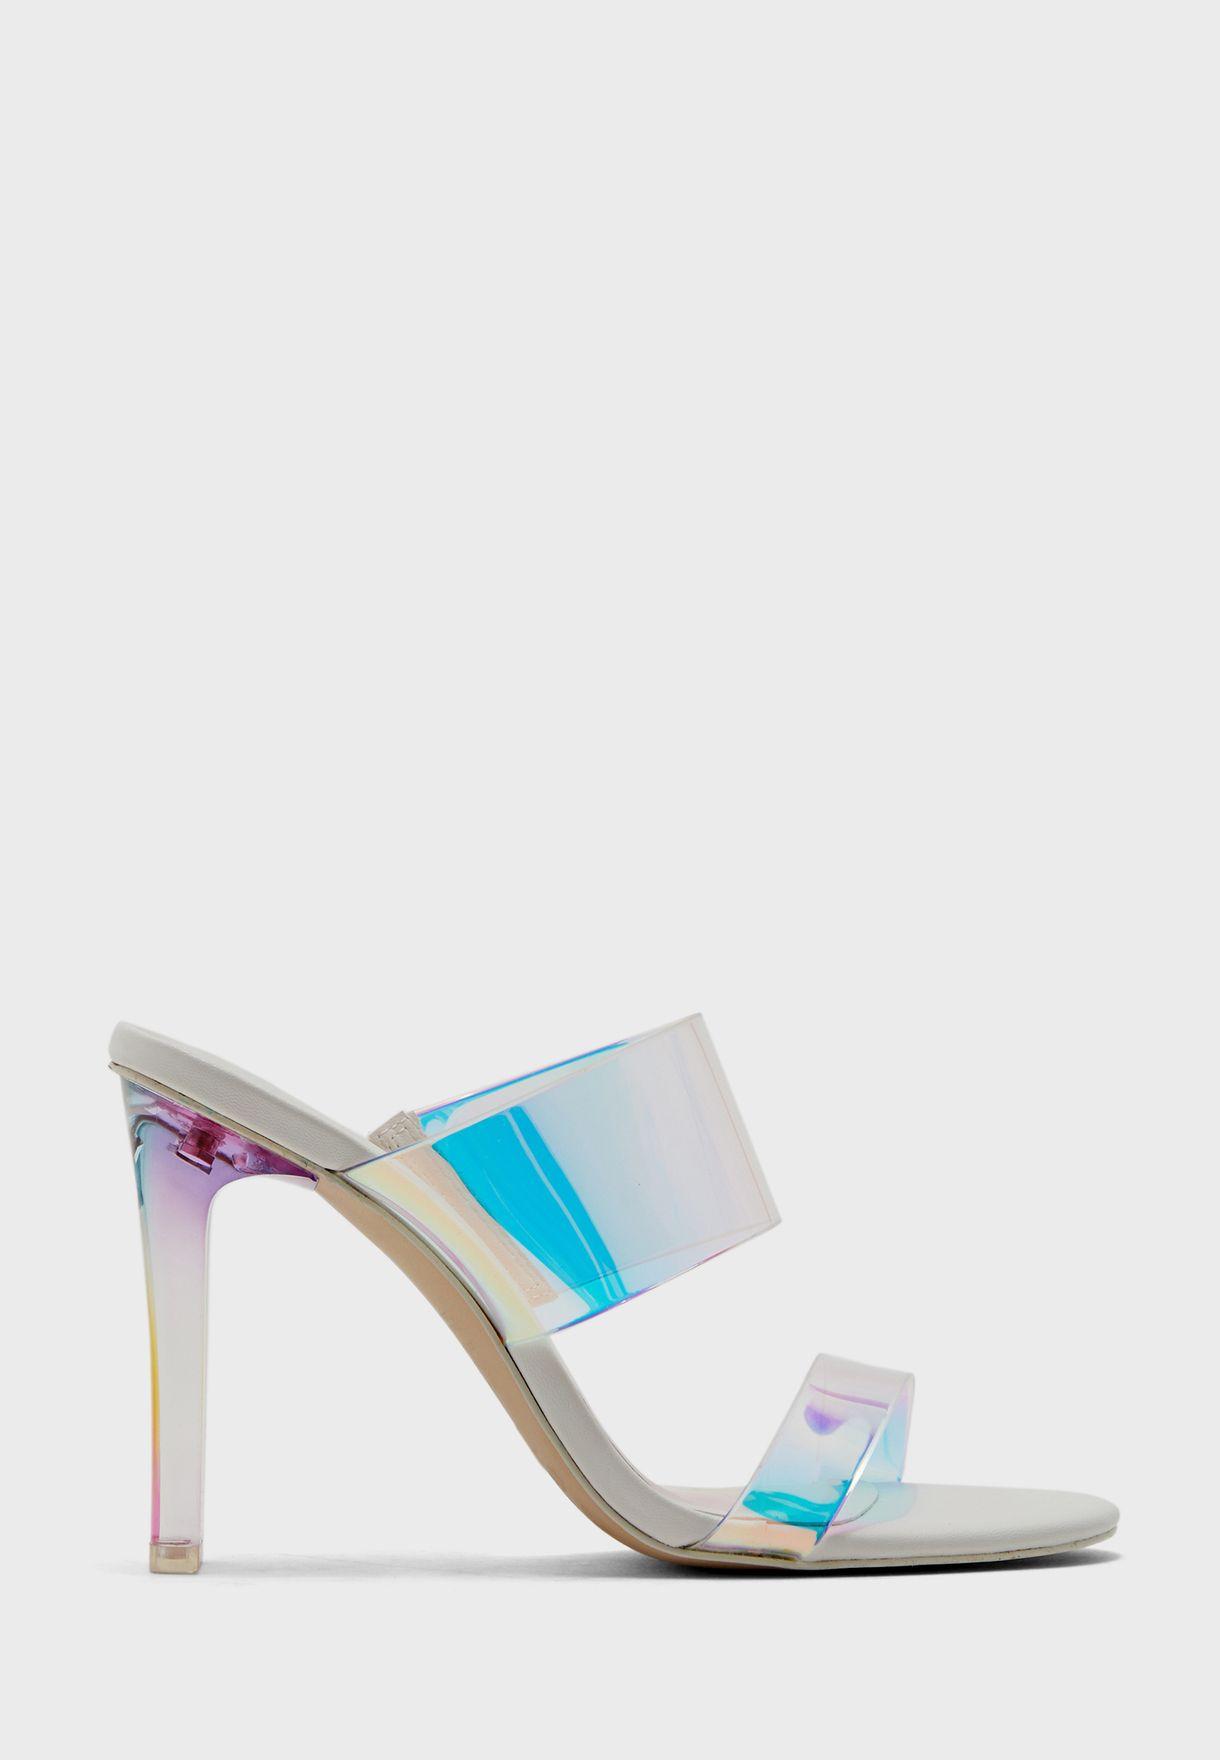 Siennaa High Heel Sandal